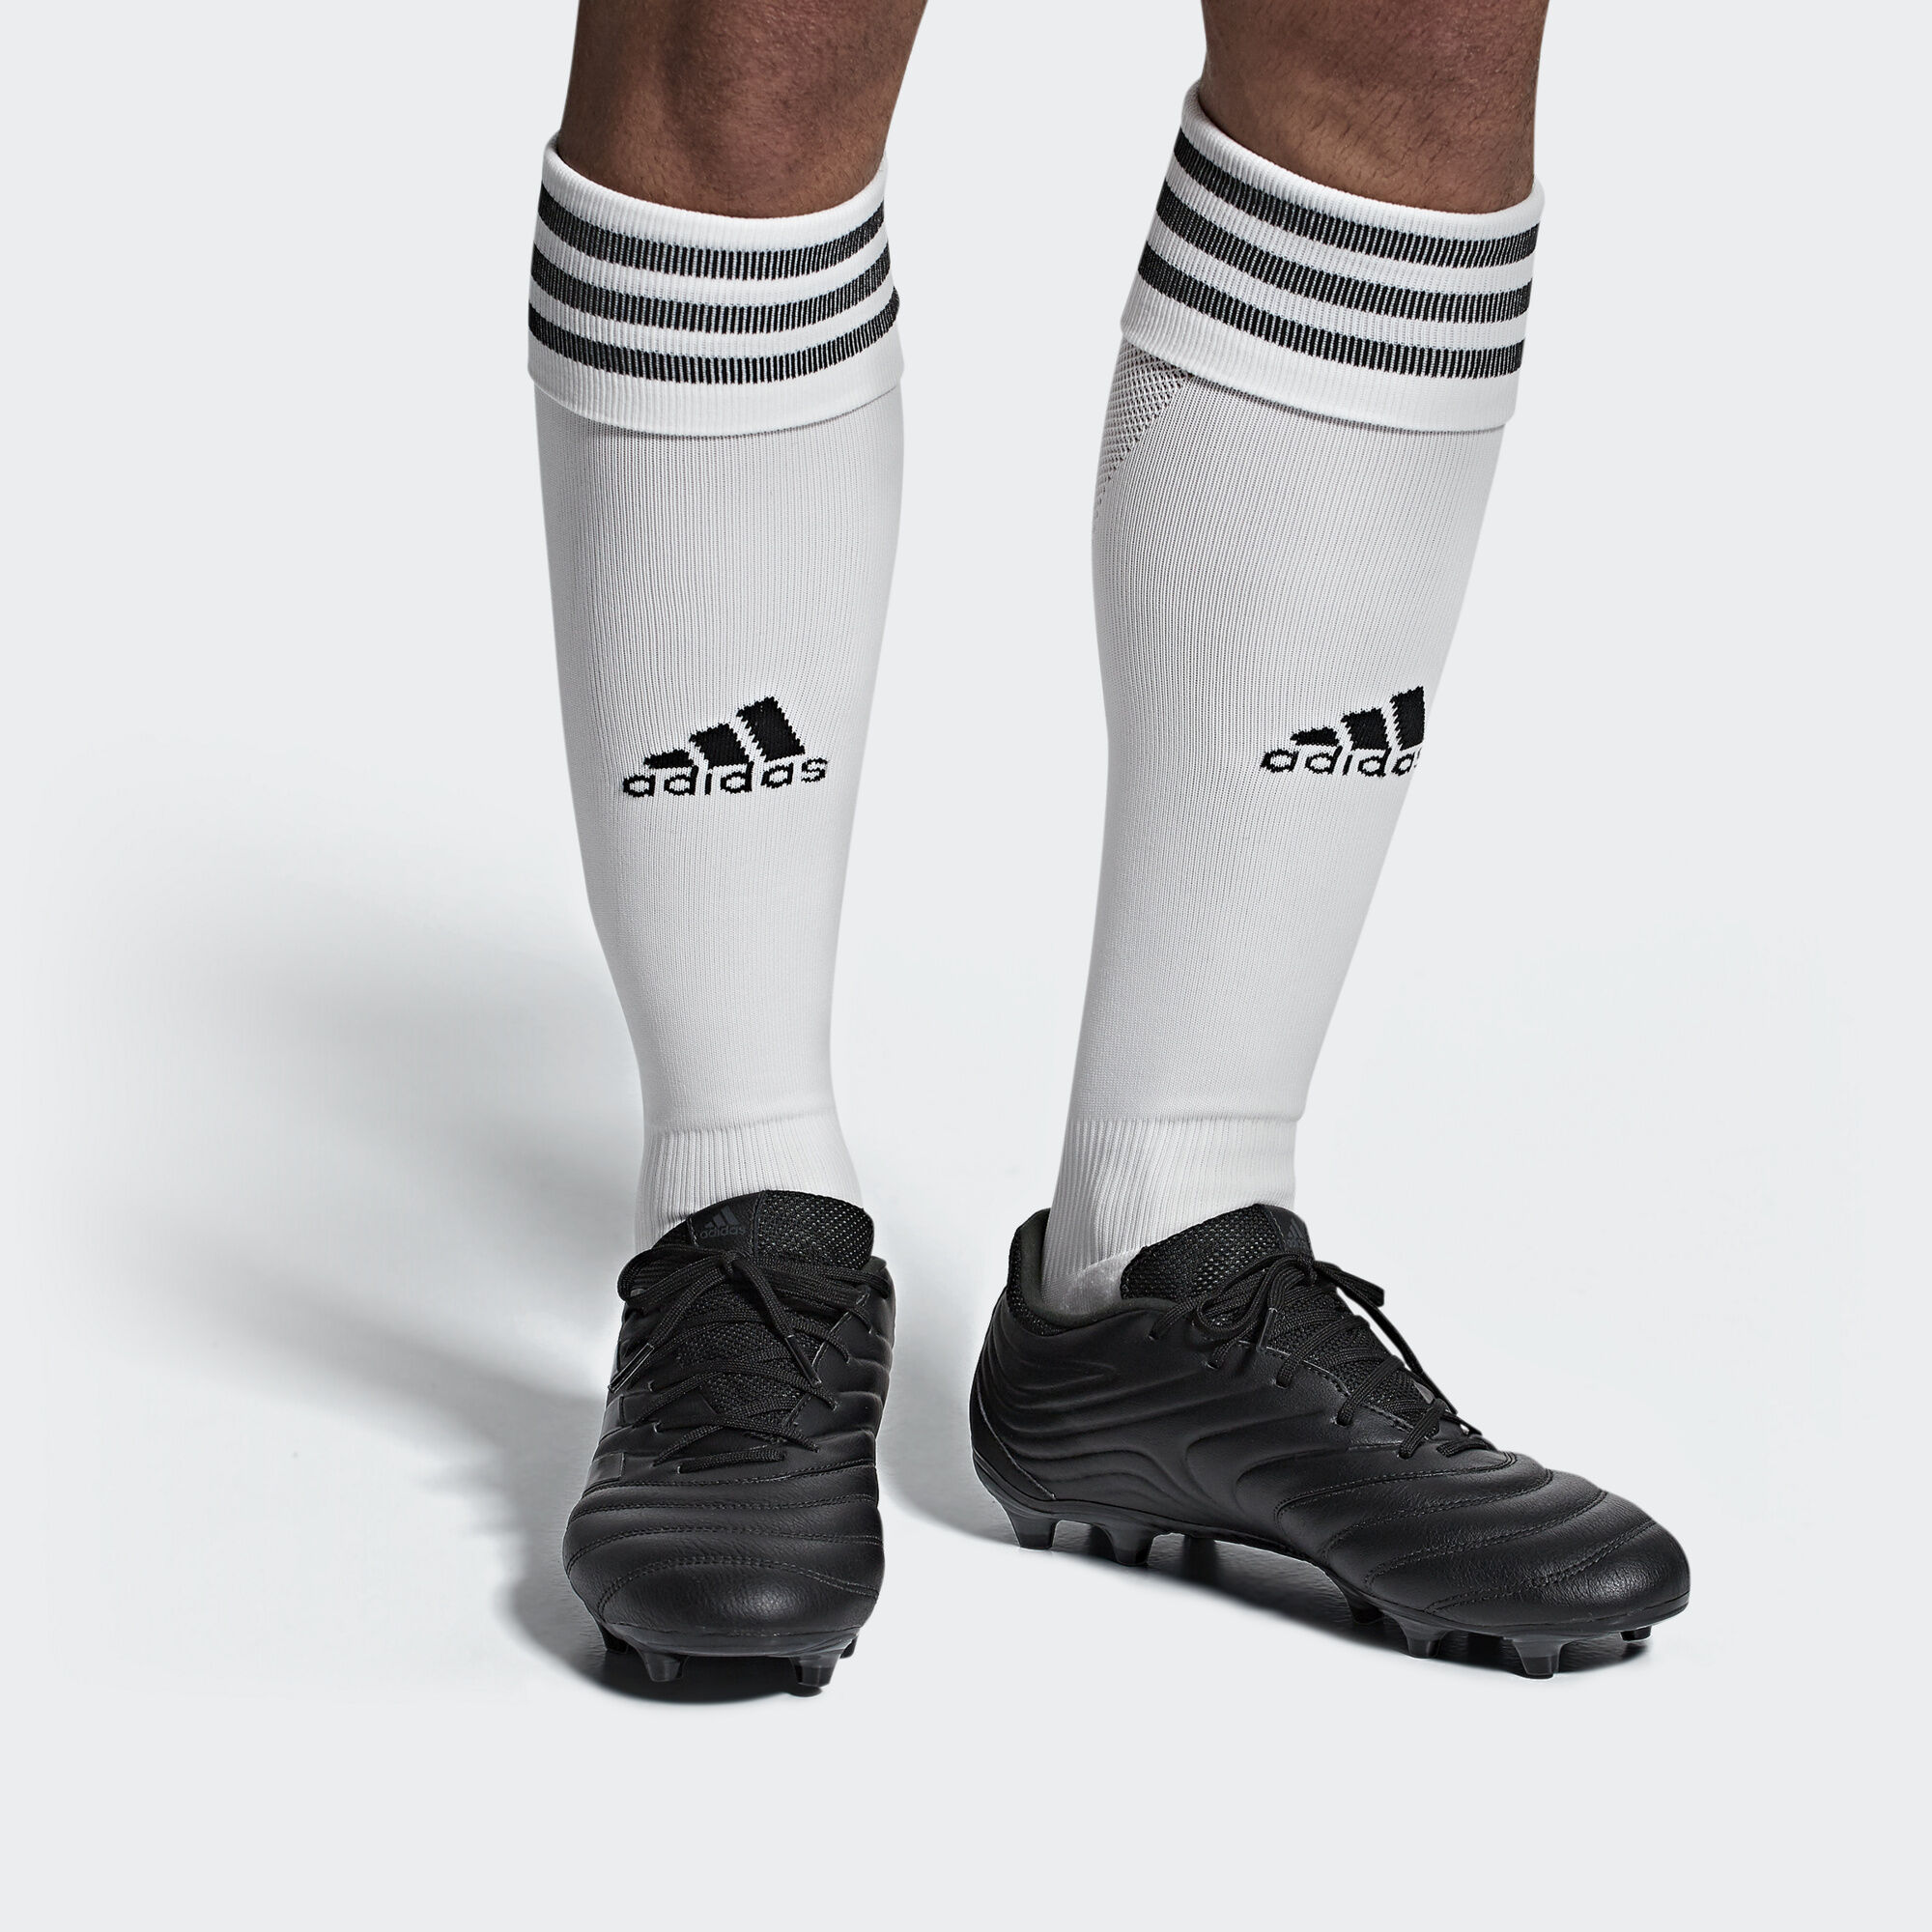 cheap for discount 3de5d dbe99 adidas Copa 19.3 Firm Ground Boots - White  adidas Australia